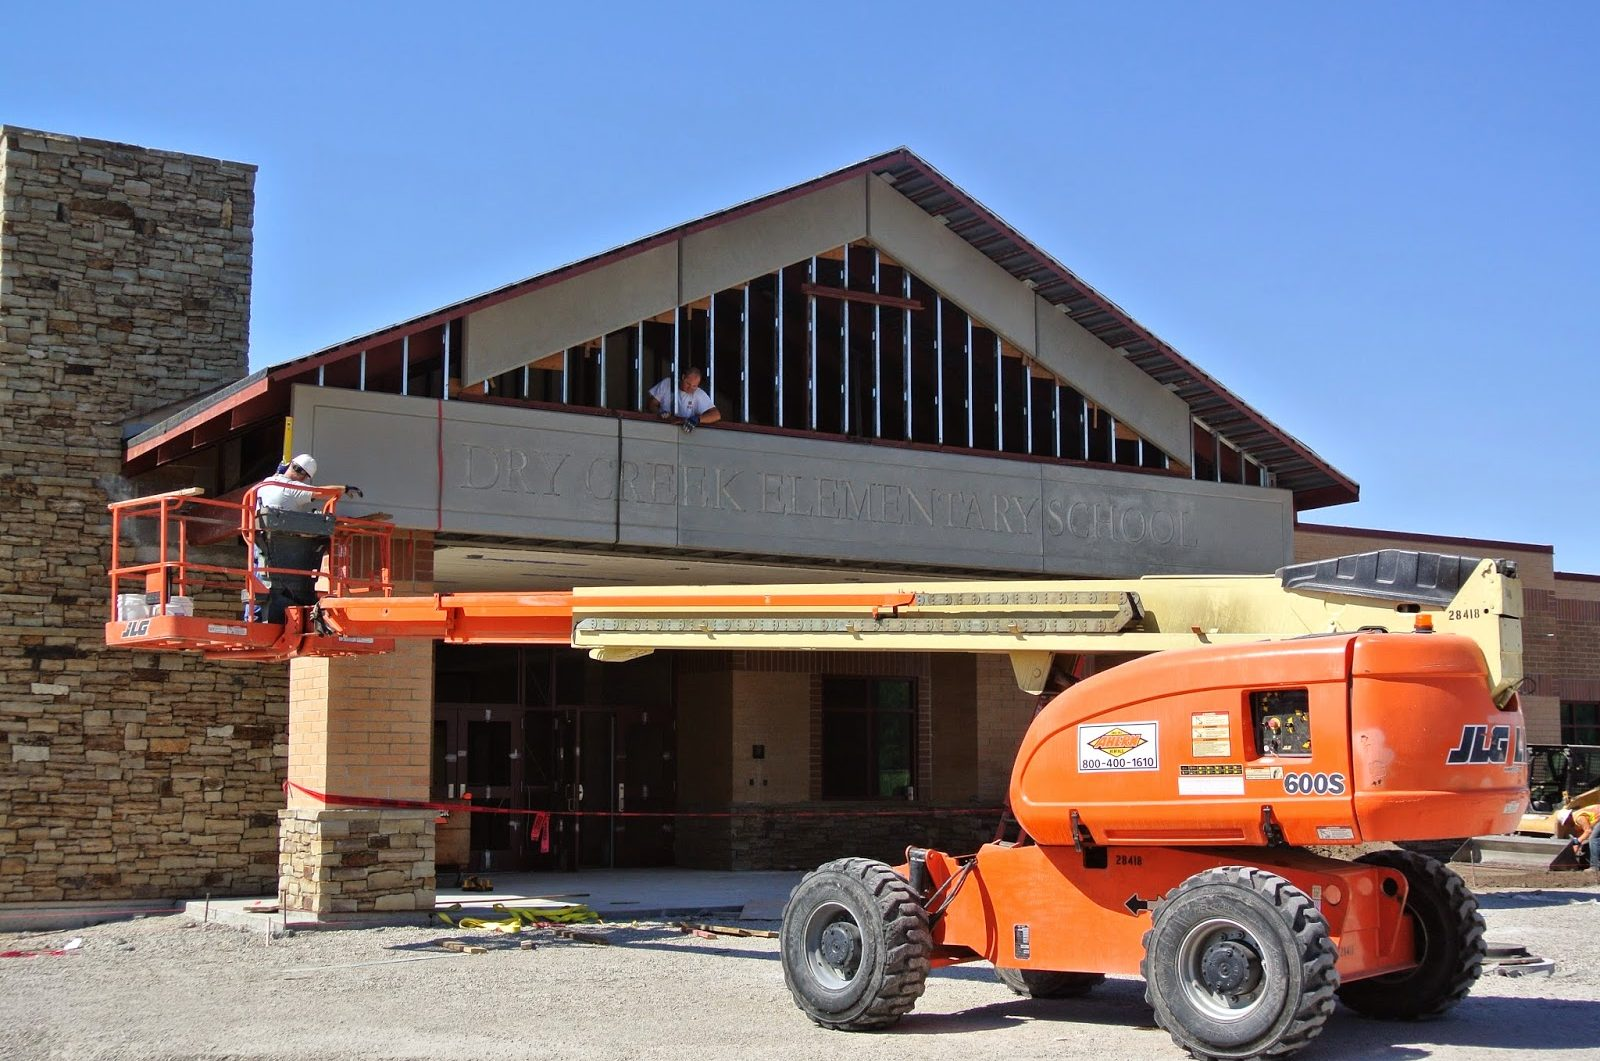 Installation of GFRC Stone Panels | Construction Site: Dry Creek Elementary School, Lehi, UT